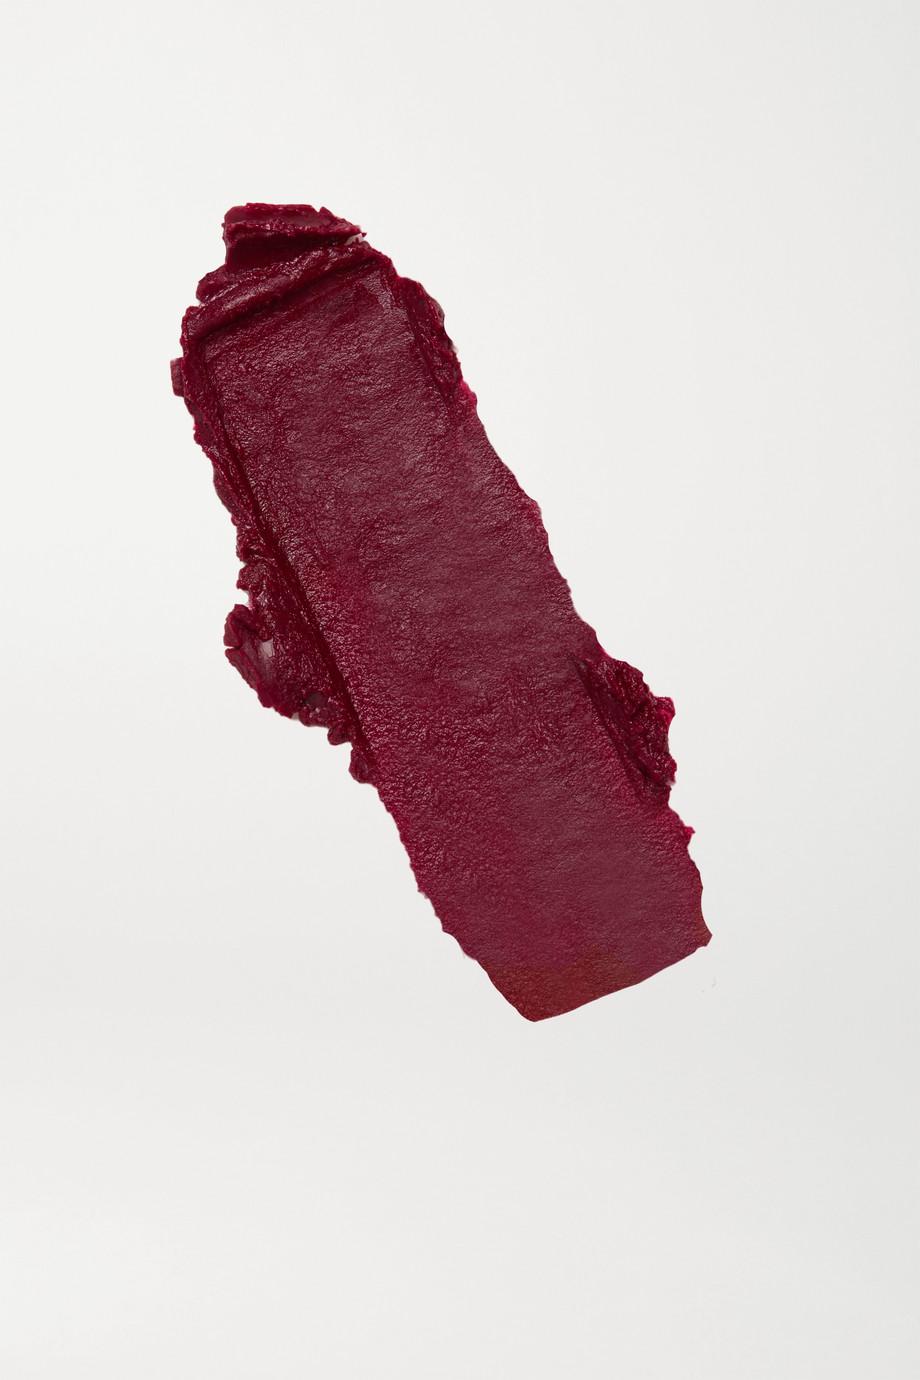 Kjaer Weis Lip Tint Refill - Goddess